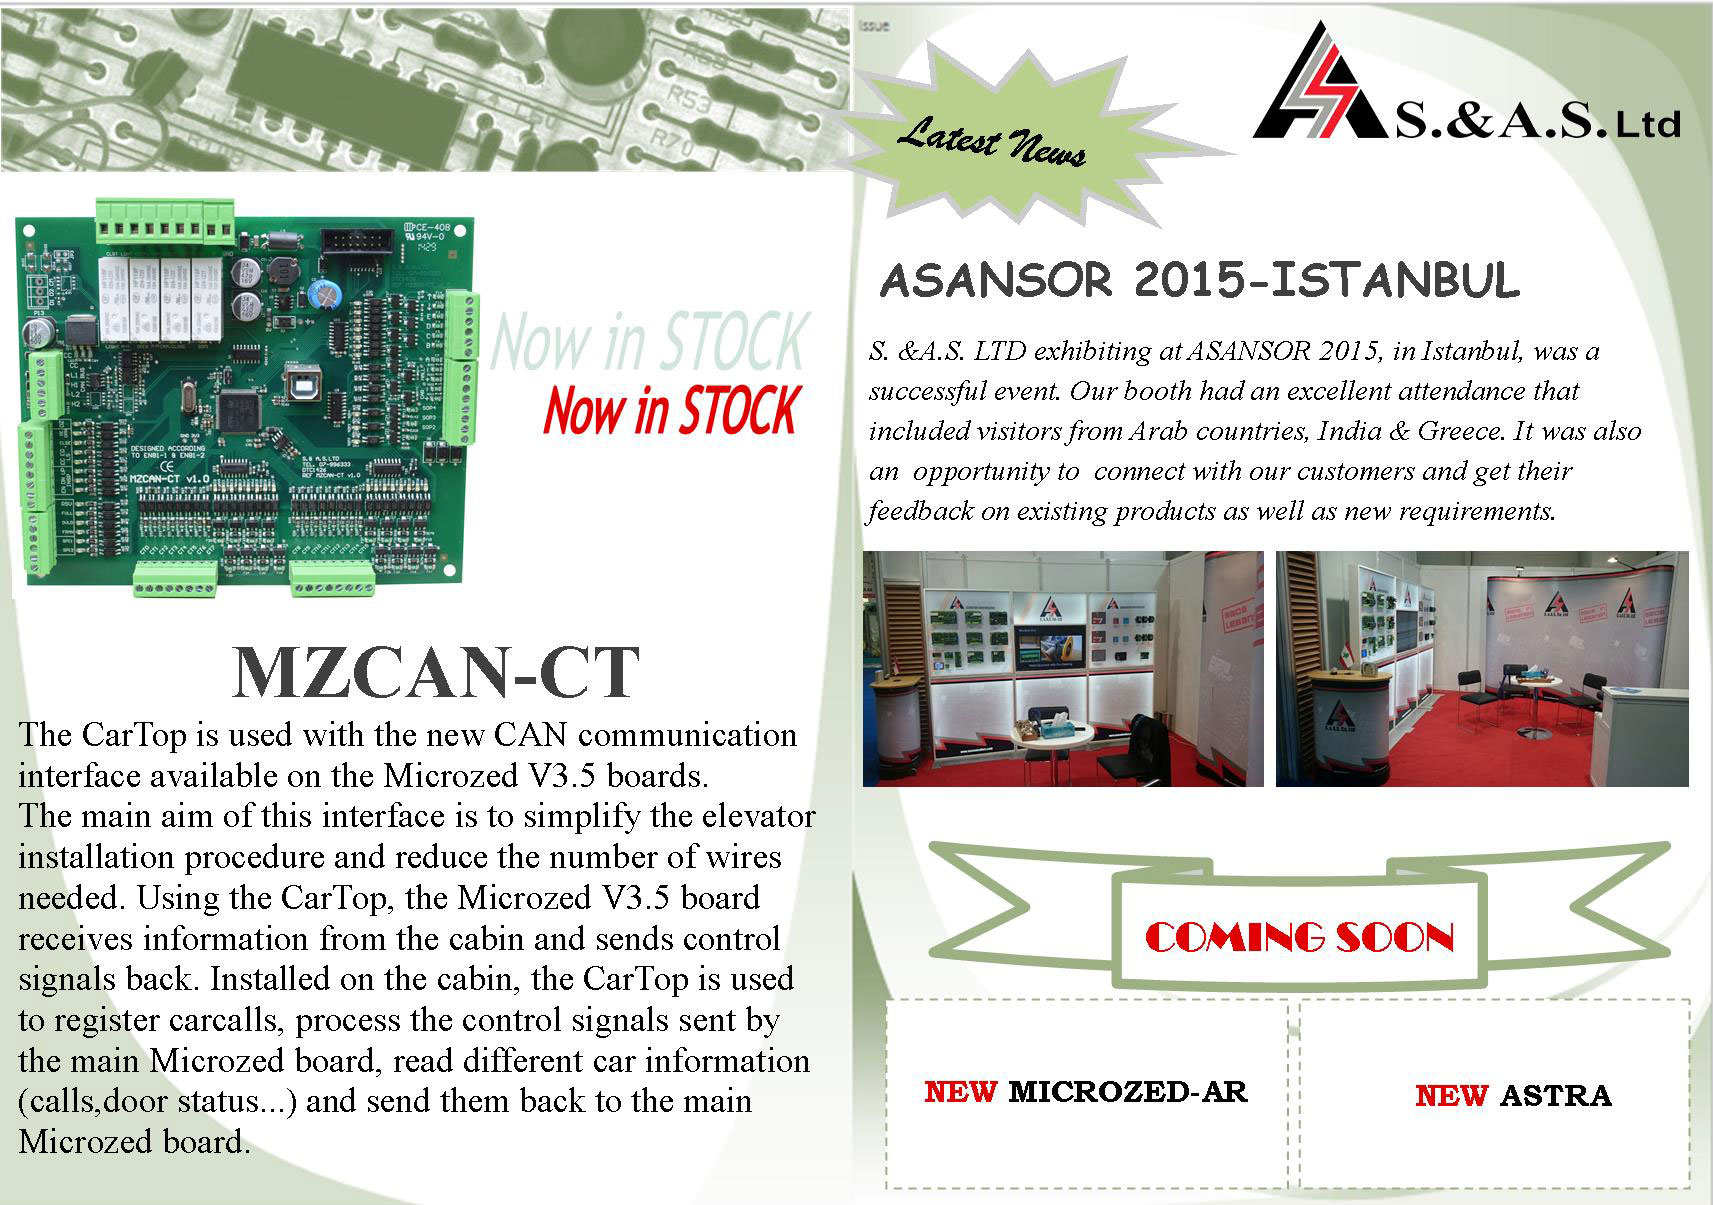 MICROZED-CAN (CARTOP)